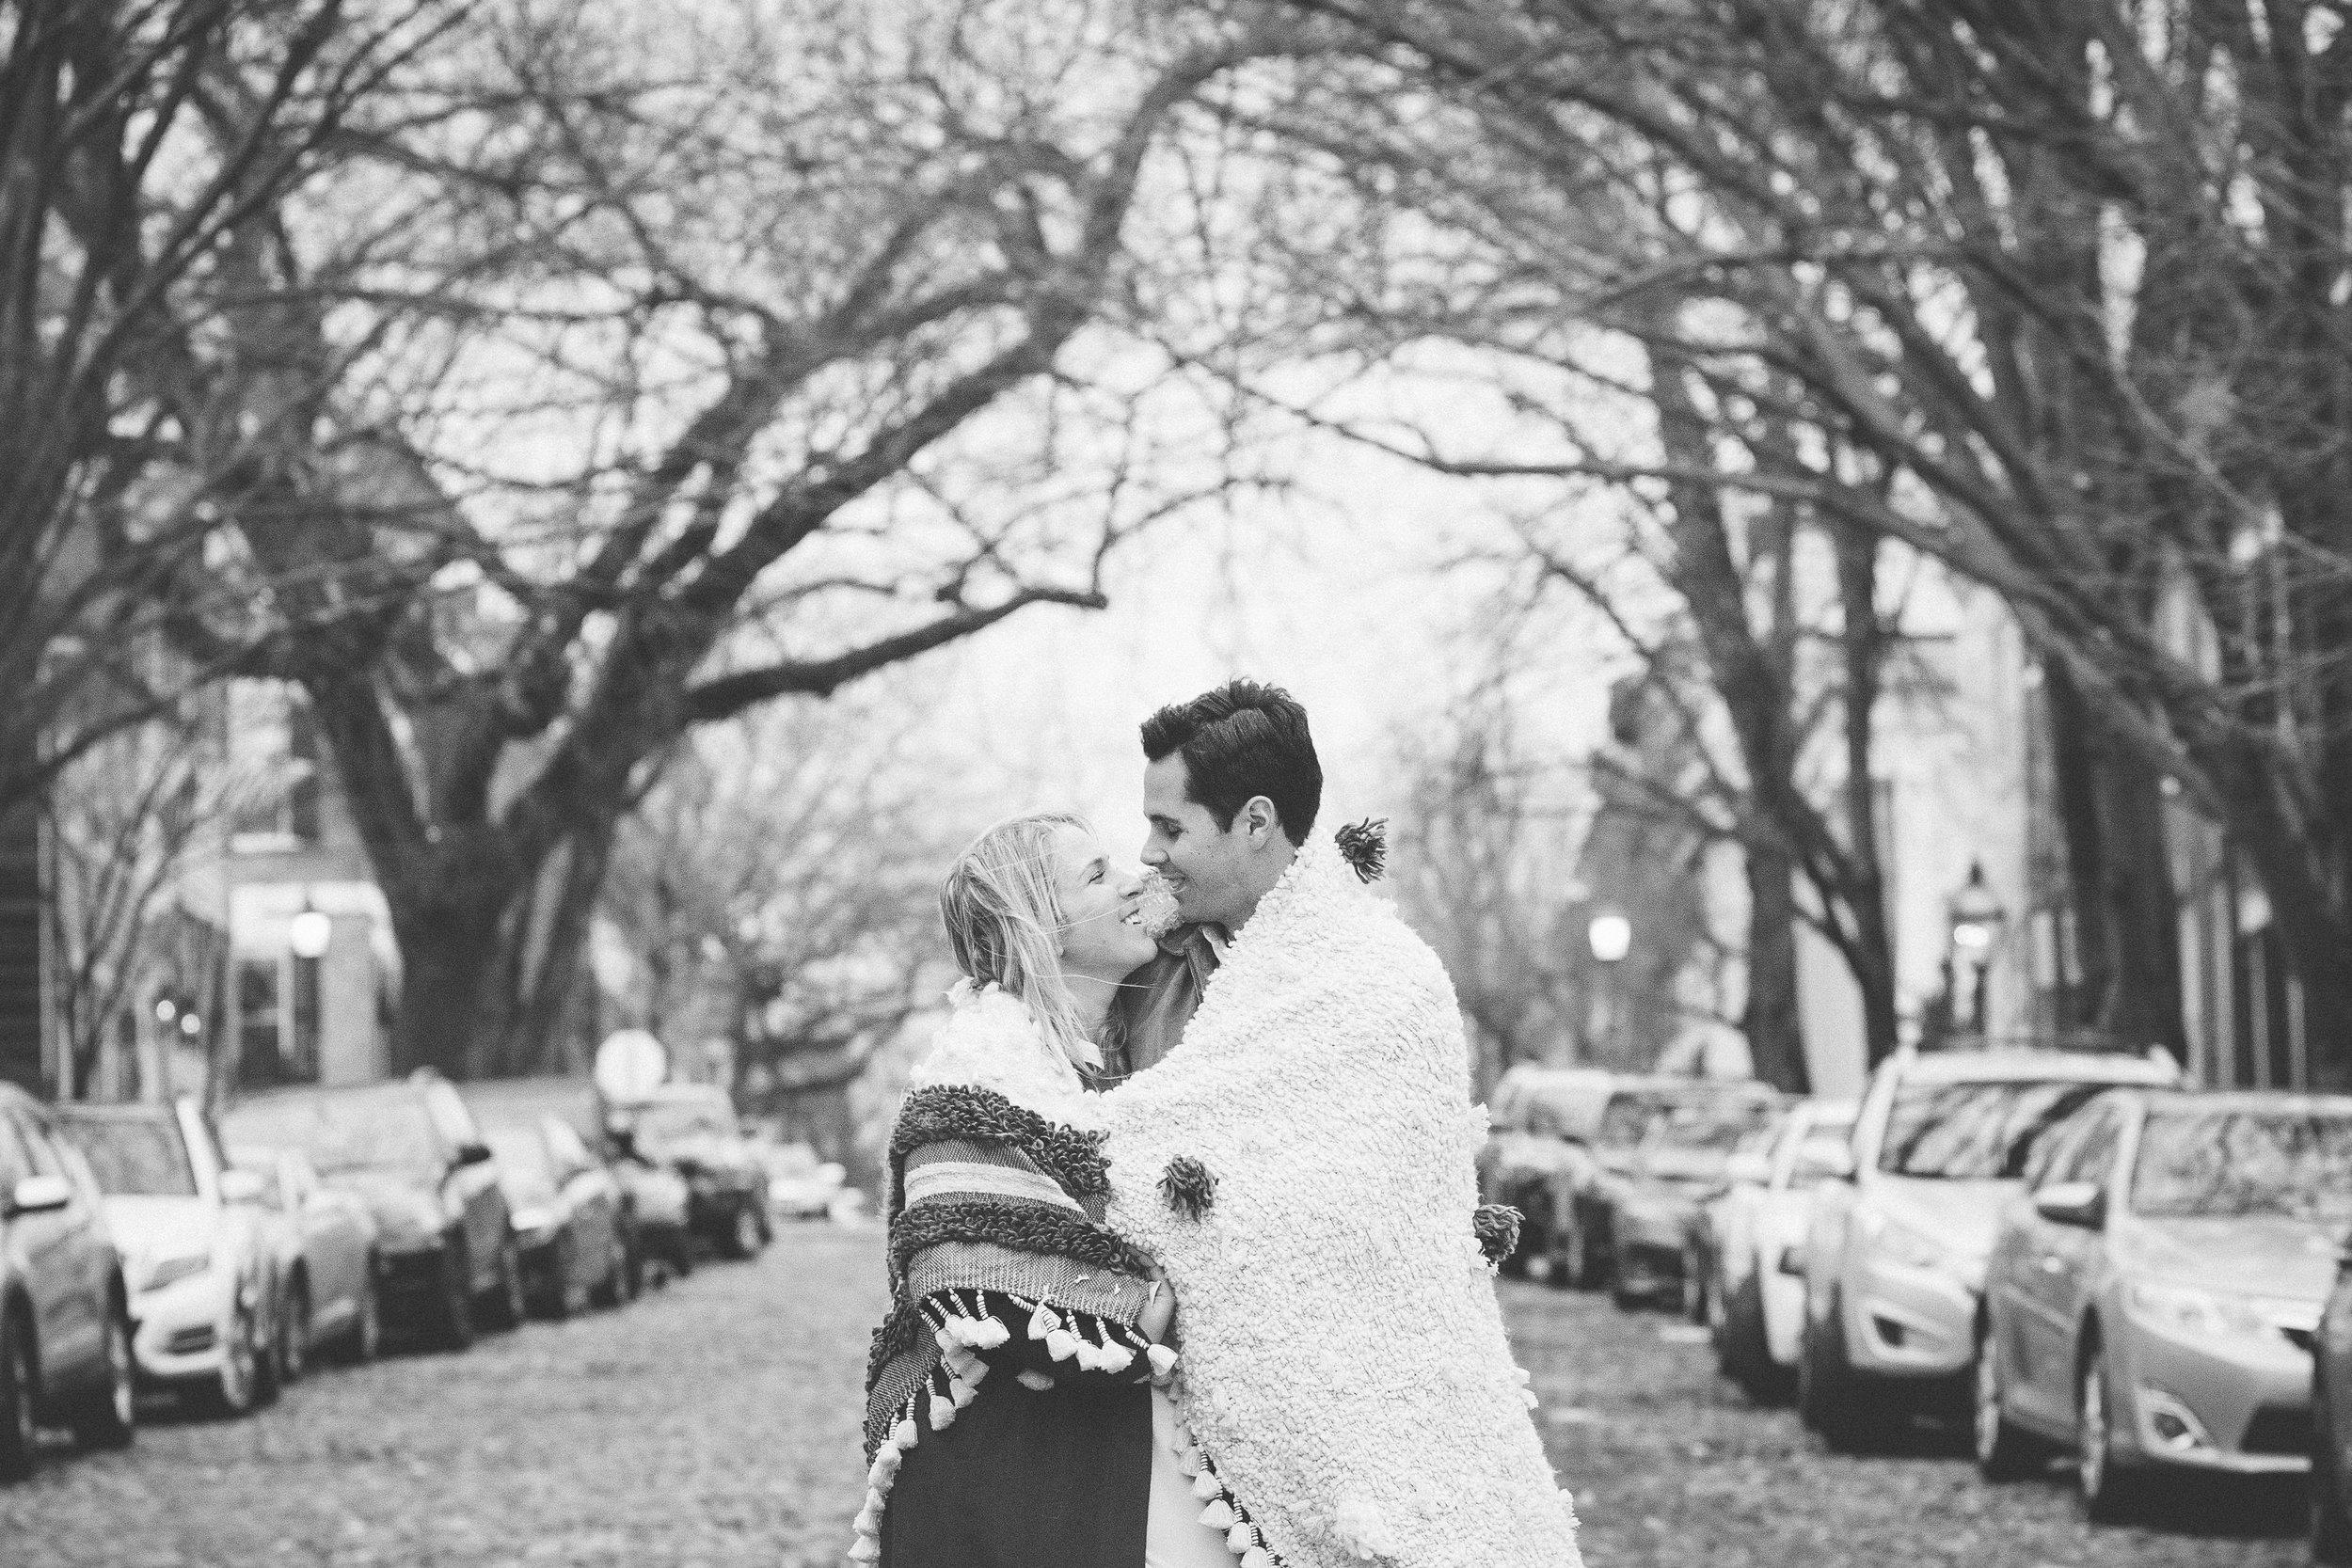 MP_16.12.18_Nick & Kendall Engagement Shoot-0338.jpg